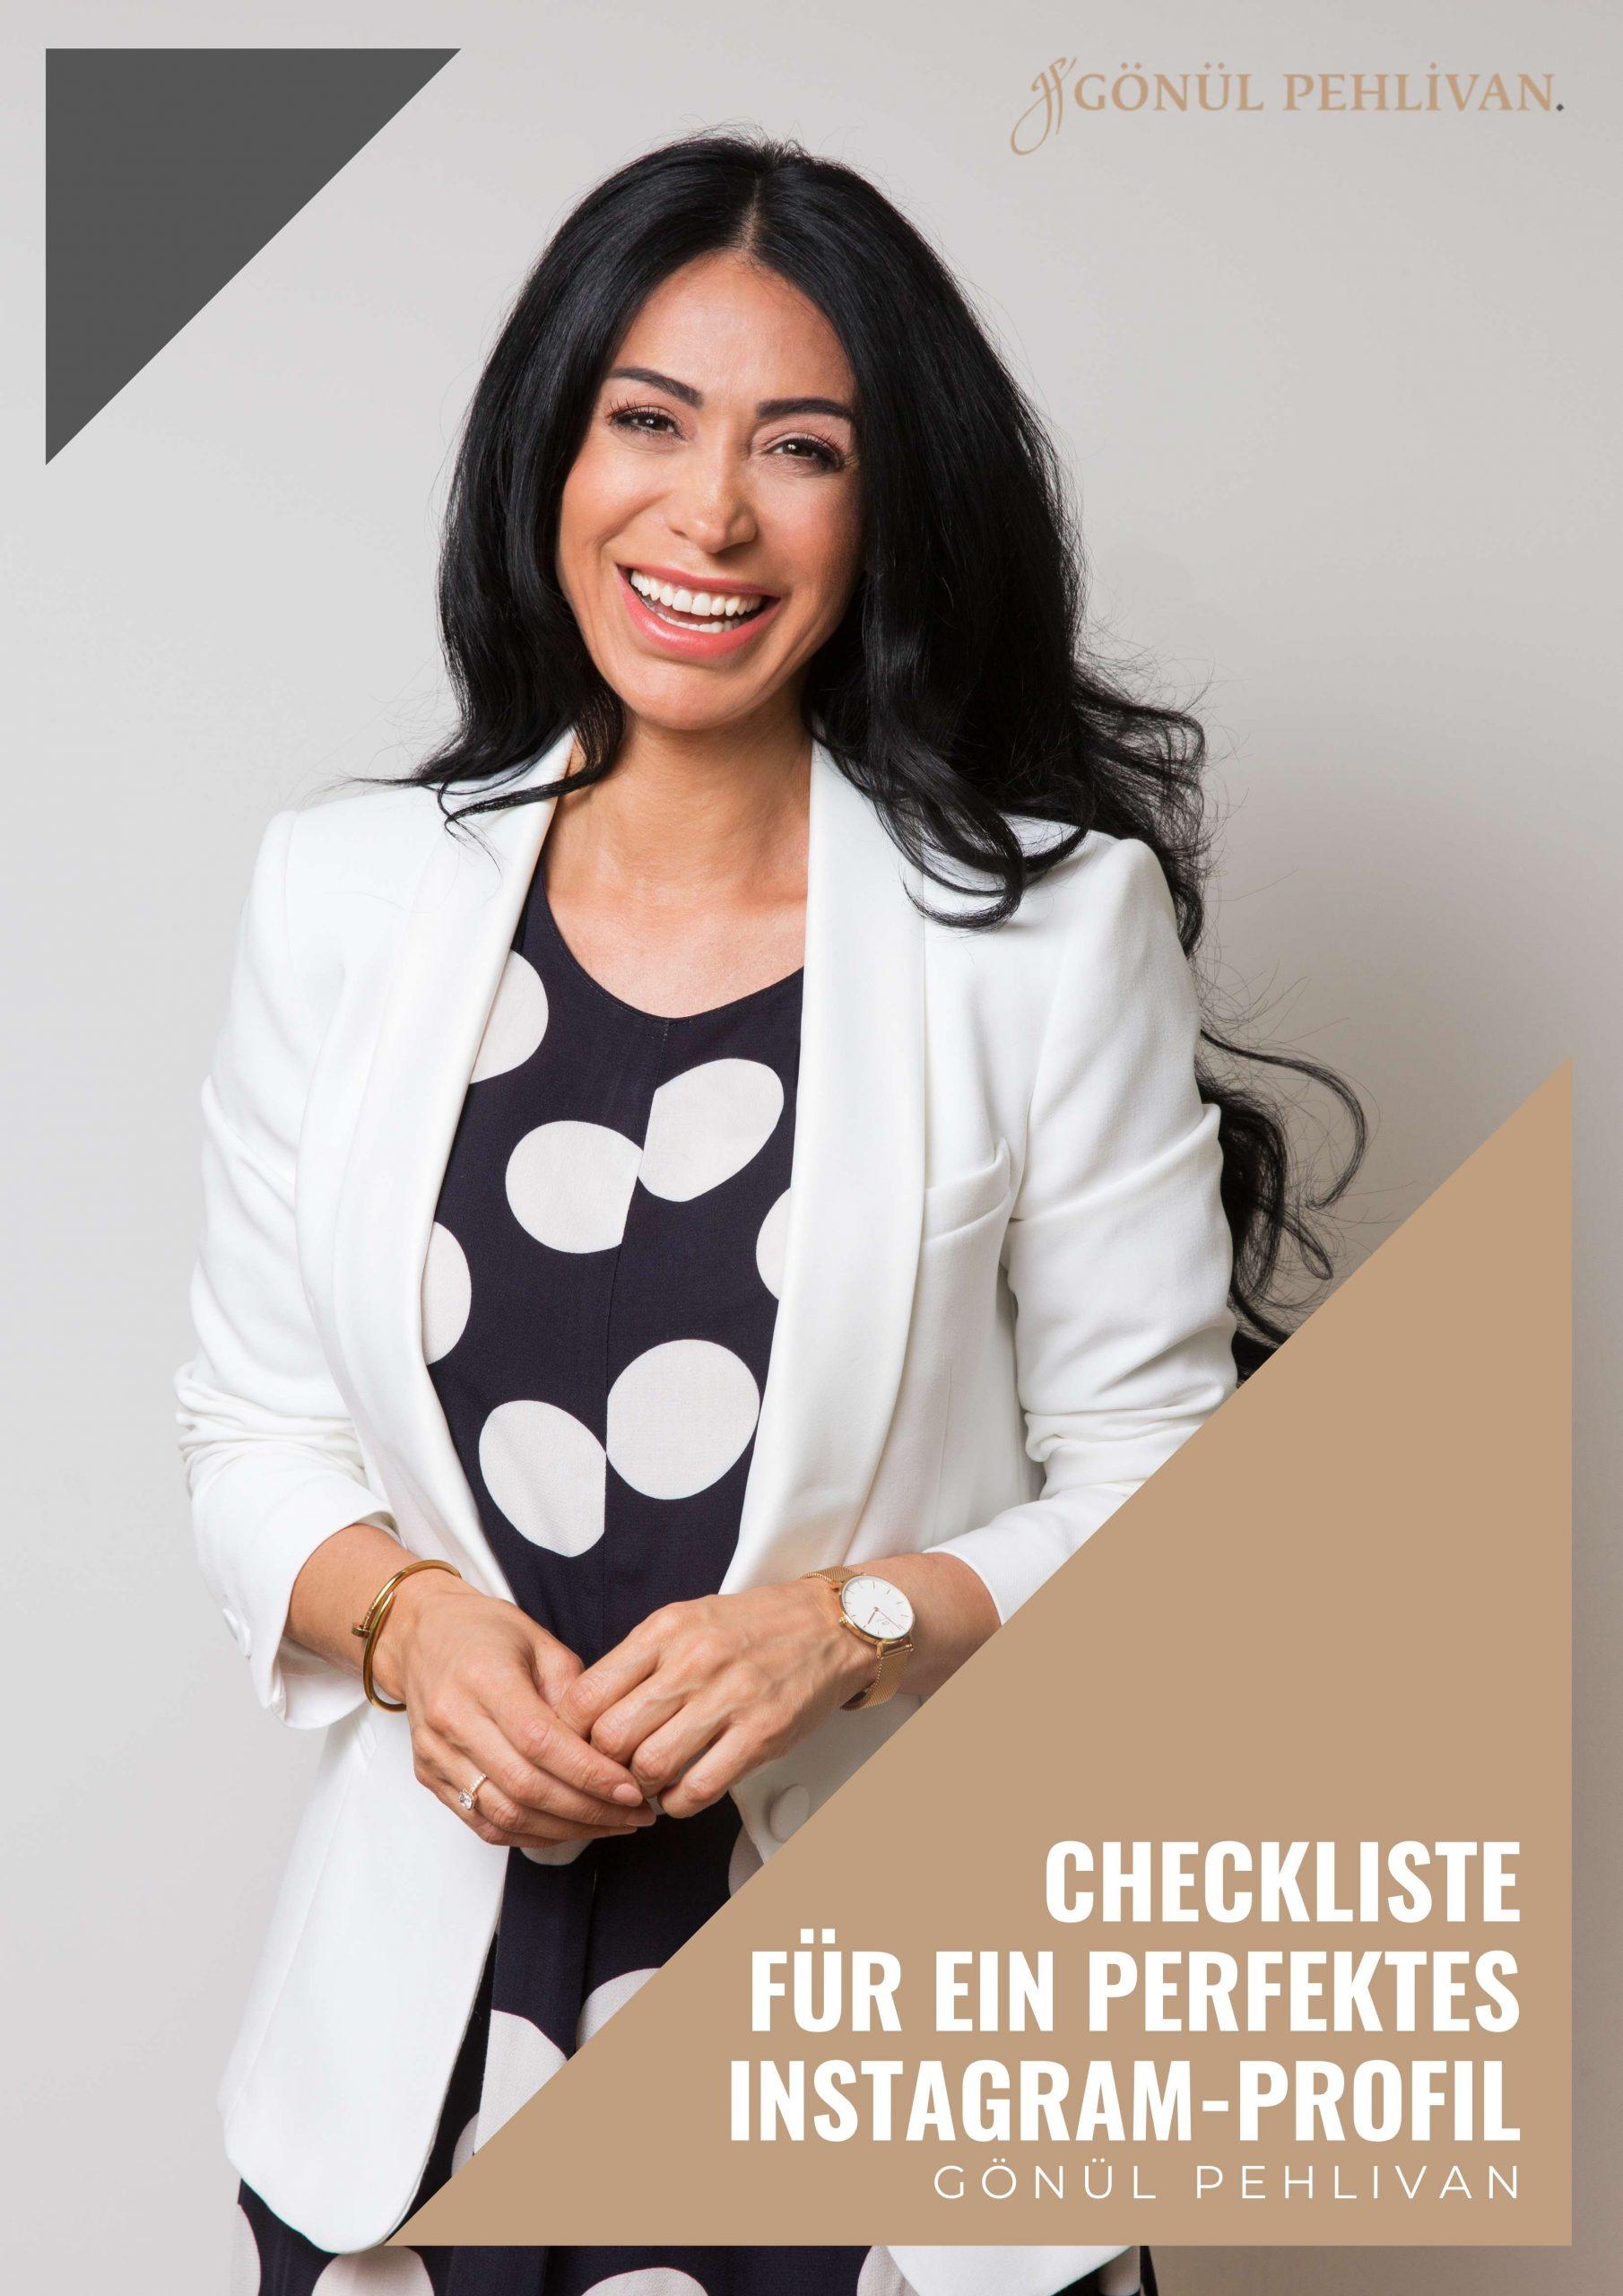 Ebook Instagram Checkliste Gönül Pehlivan Web 2